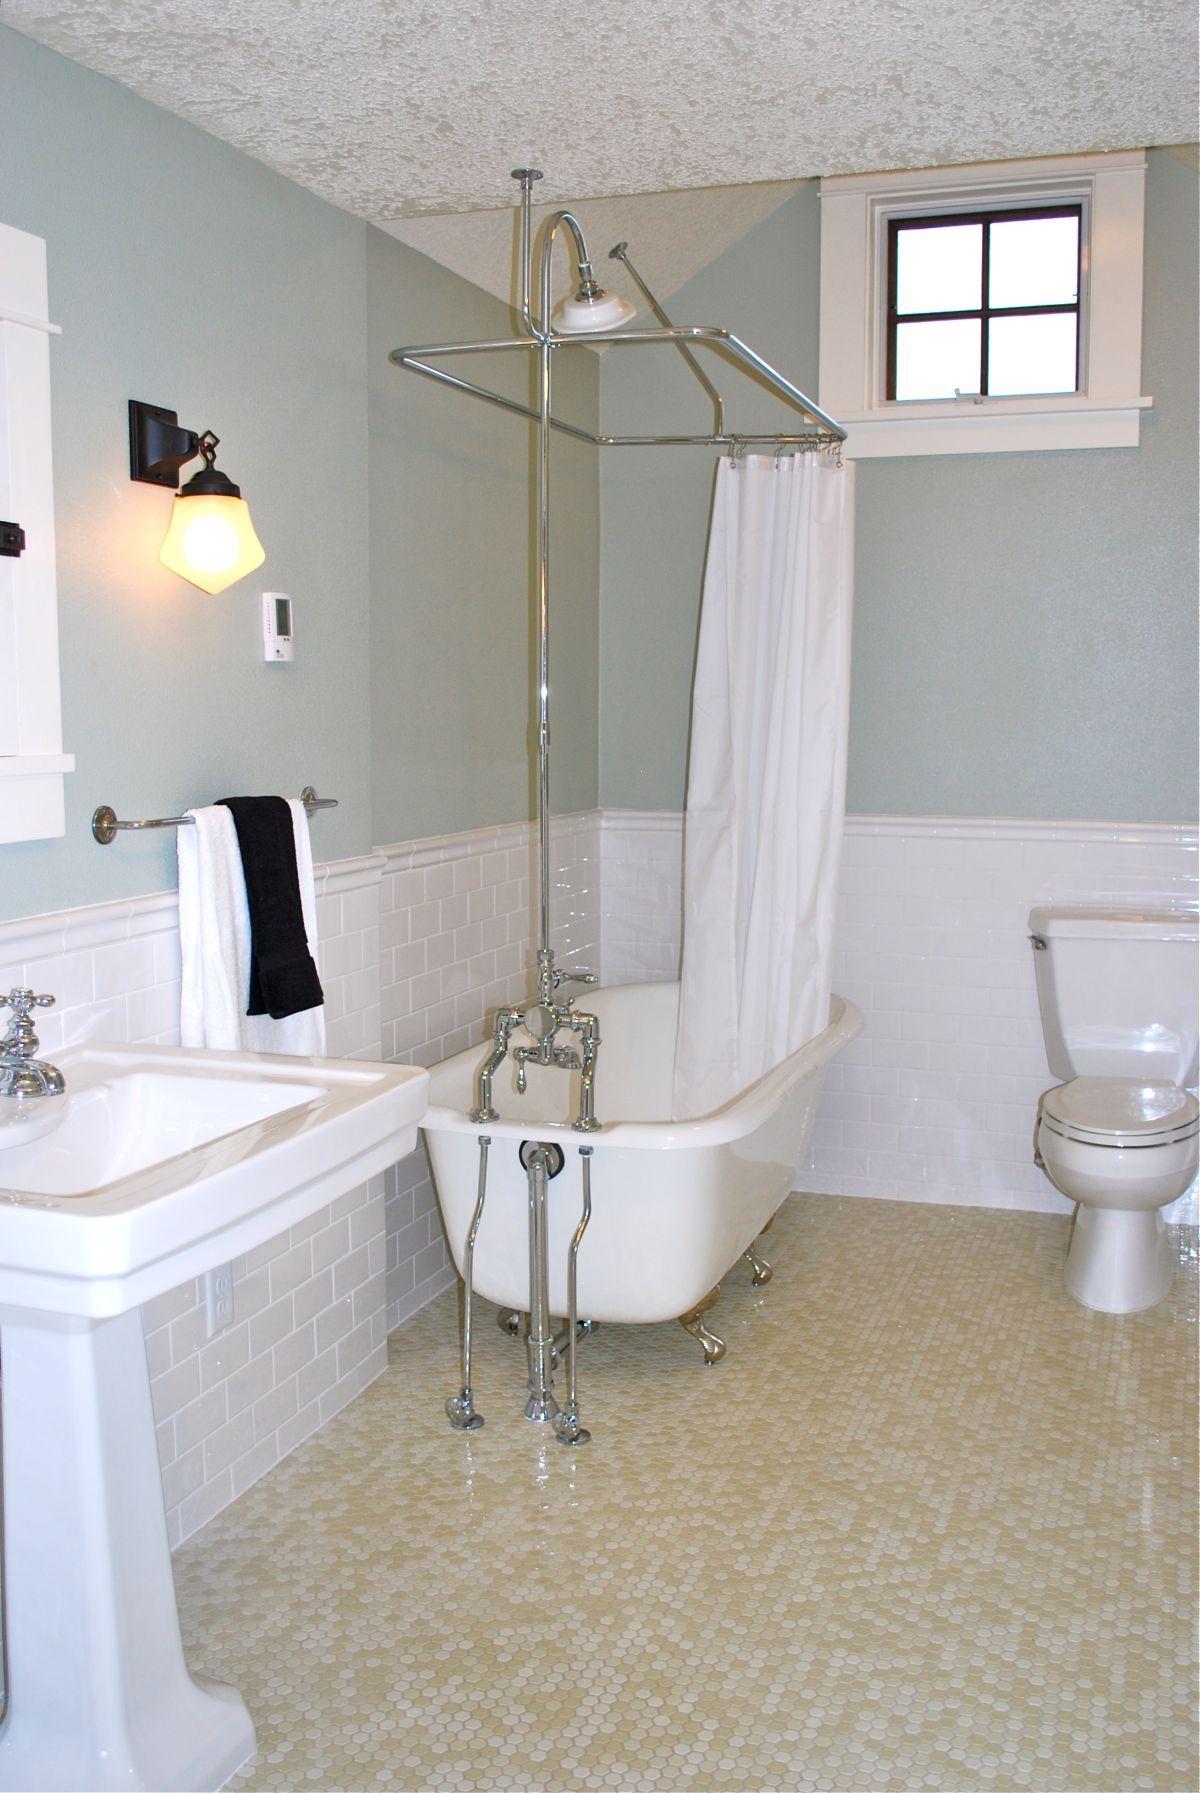 Green SlipDoctors Anti-Slip Bathtub//Shower Treatment Kit